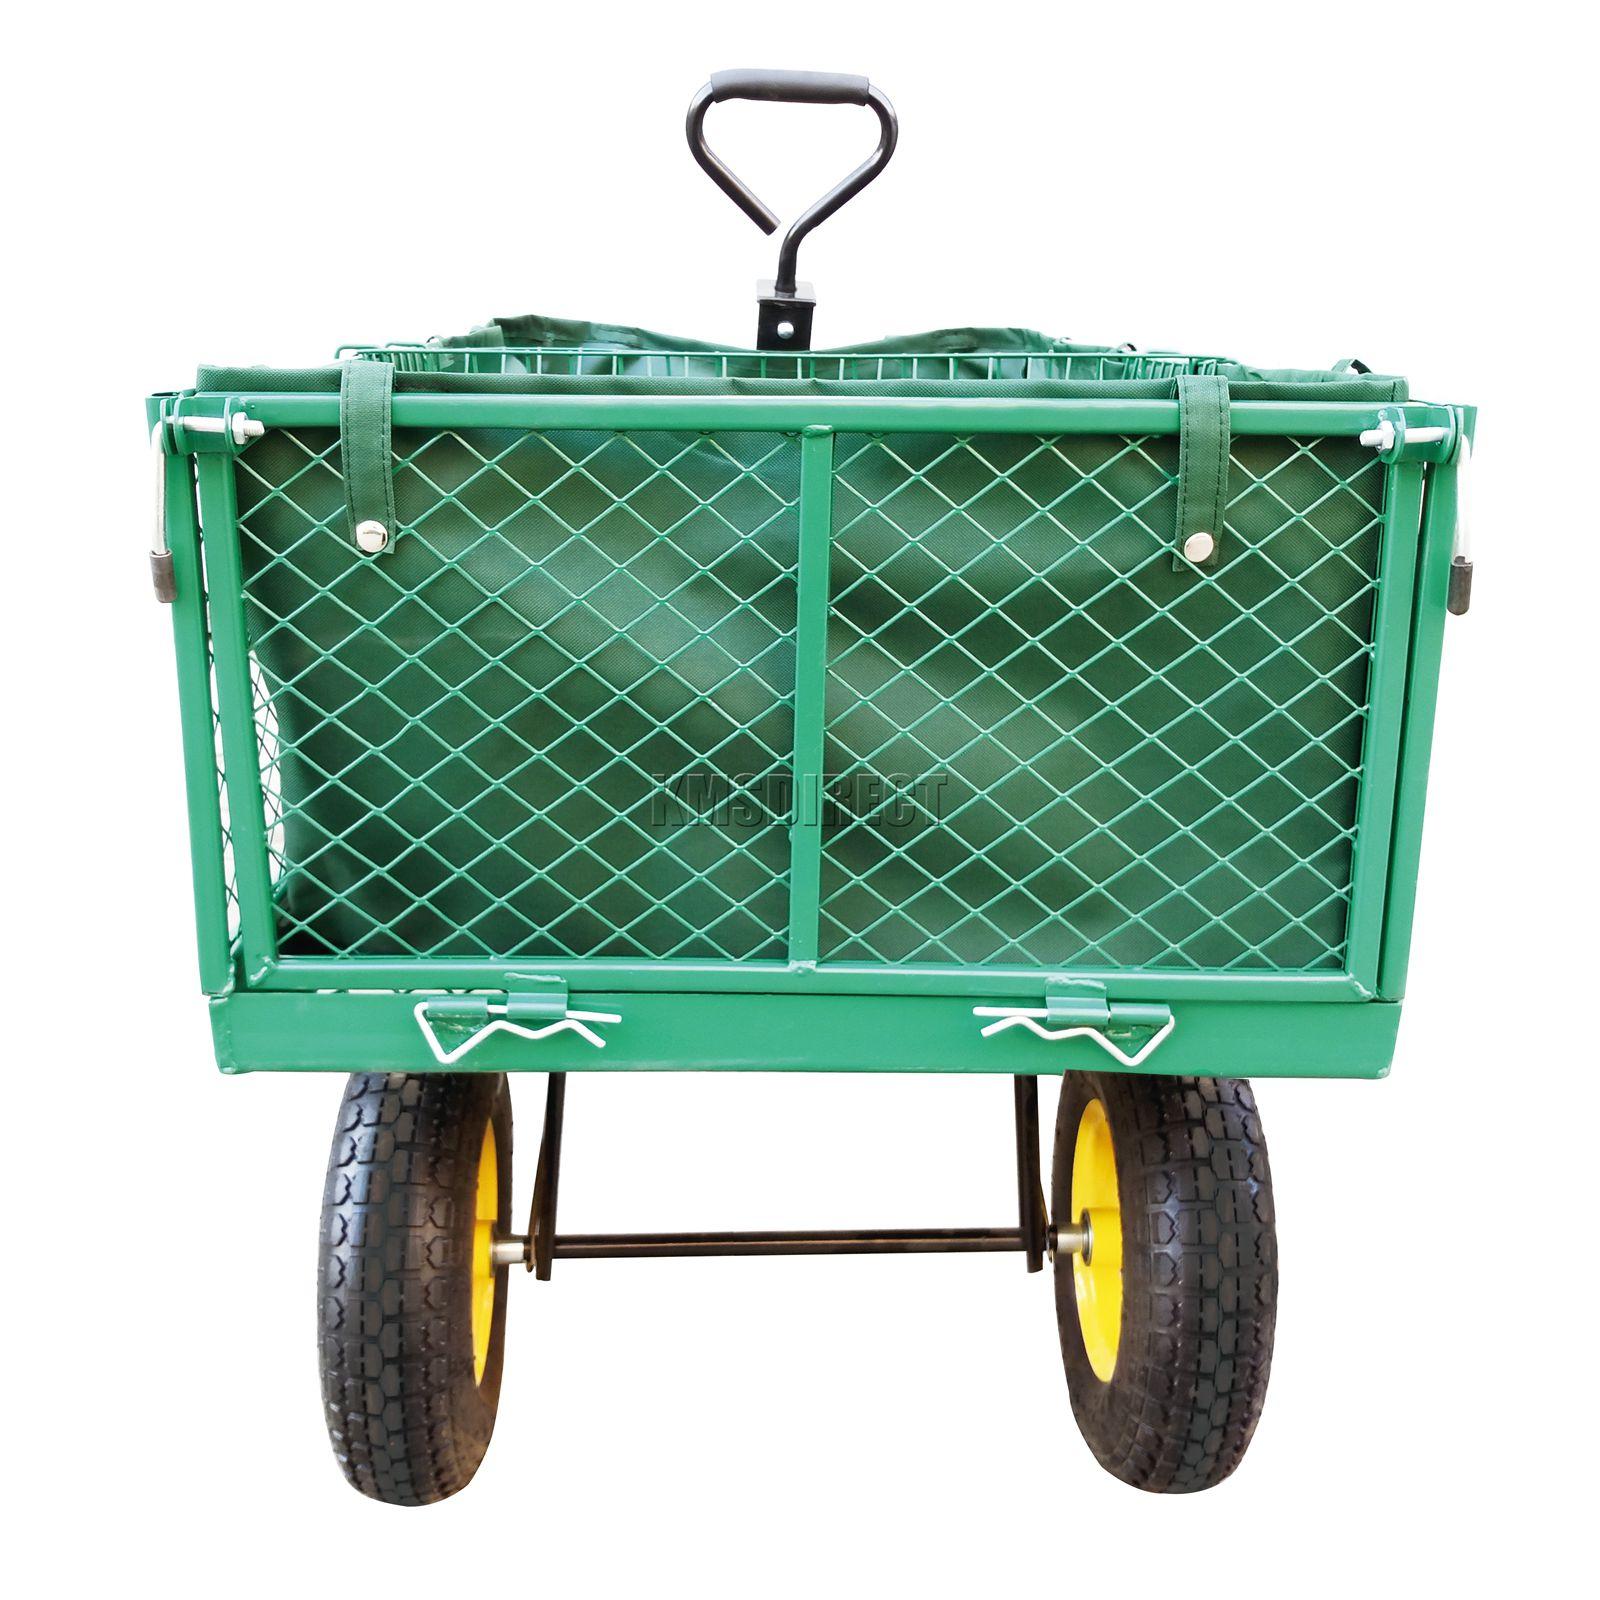 Foxhunter heavy duty jardin camion benne remorque basculante chariot panier brouette